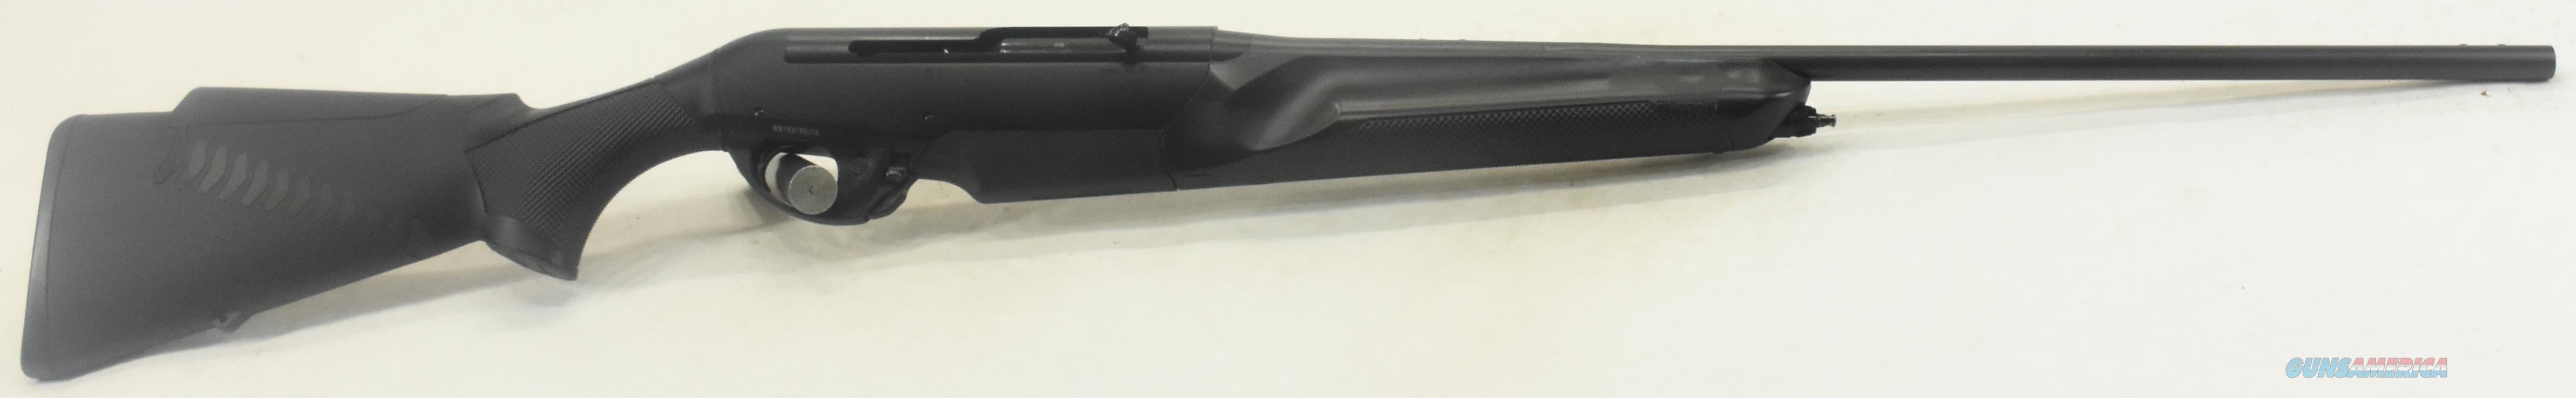 11772 Benelli R1 Big Game All Black 300 Win Mag 24In  Guns > Rifles > Benelli Rifles